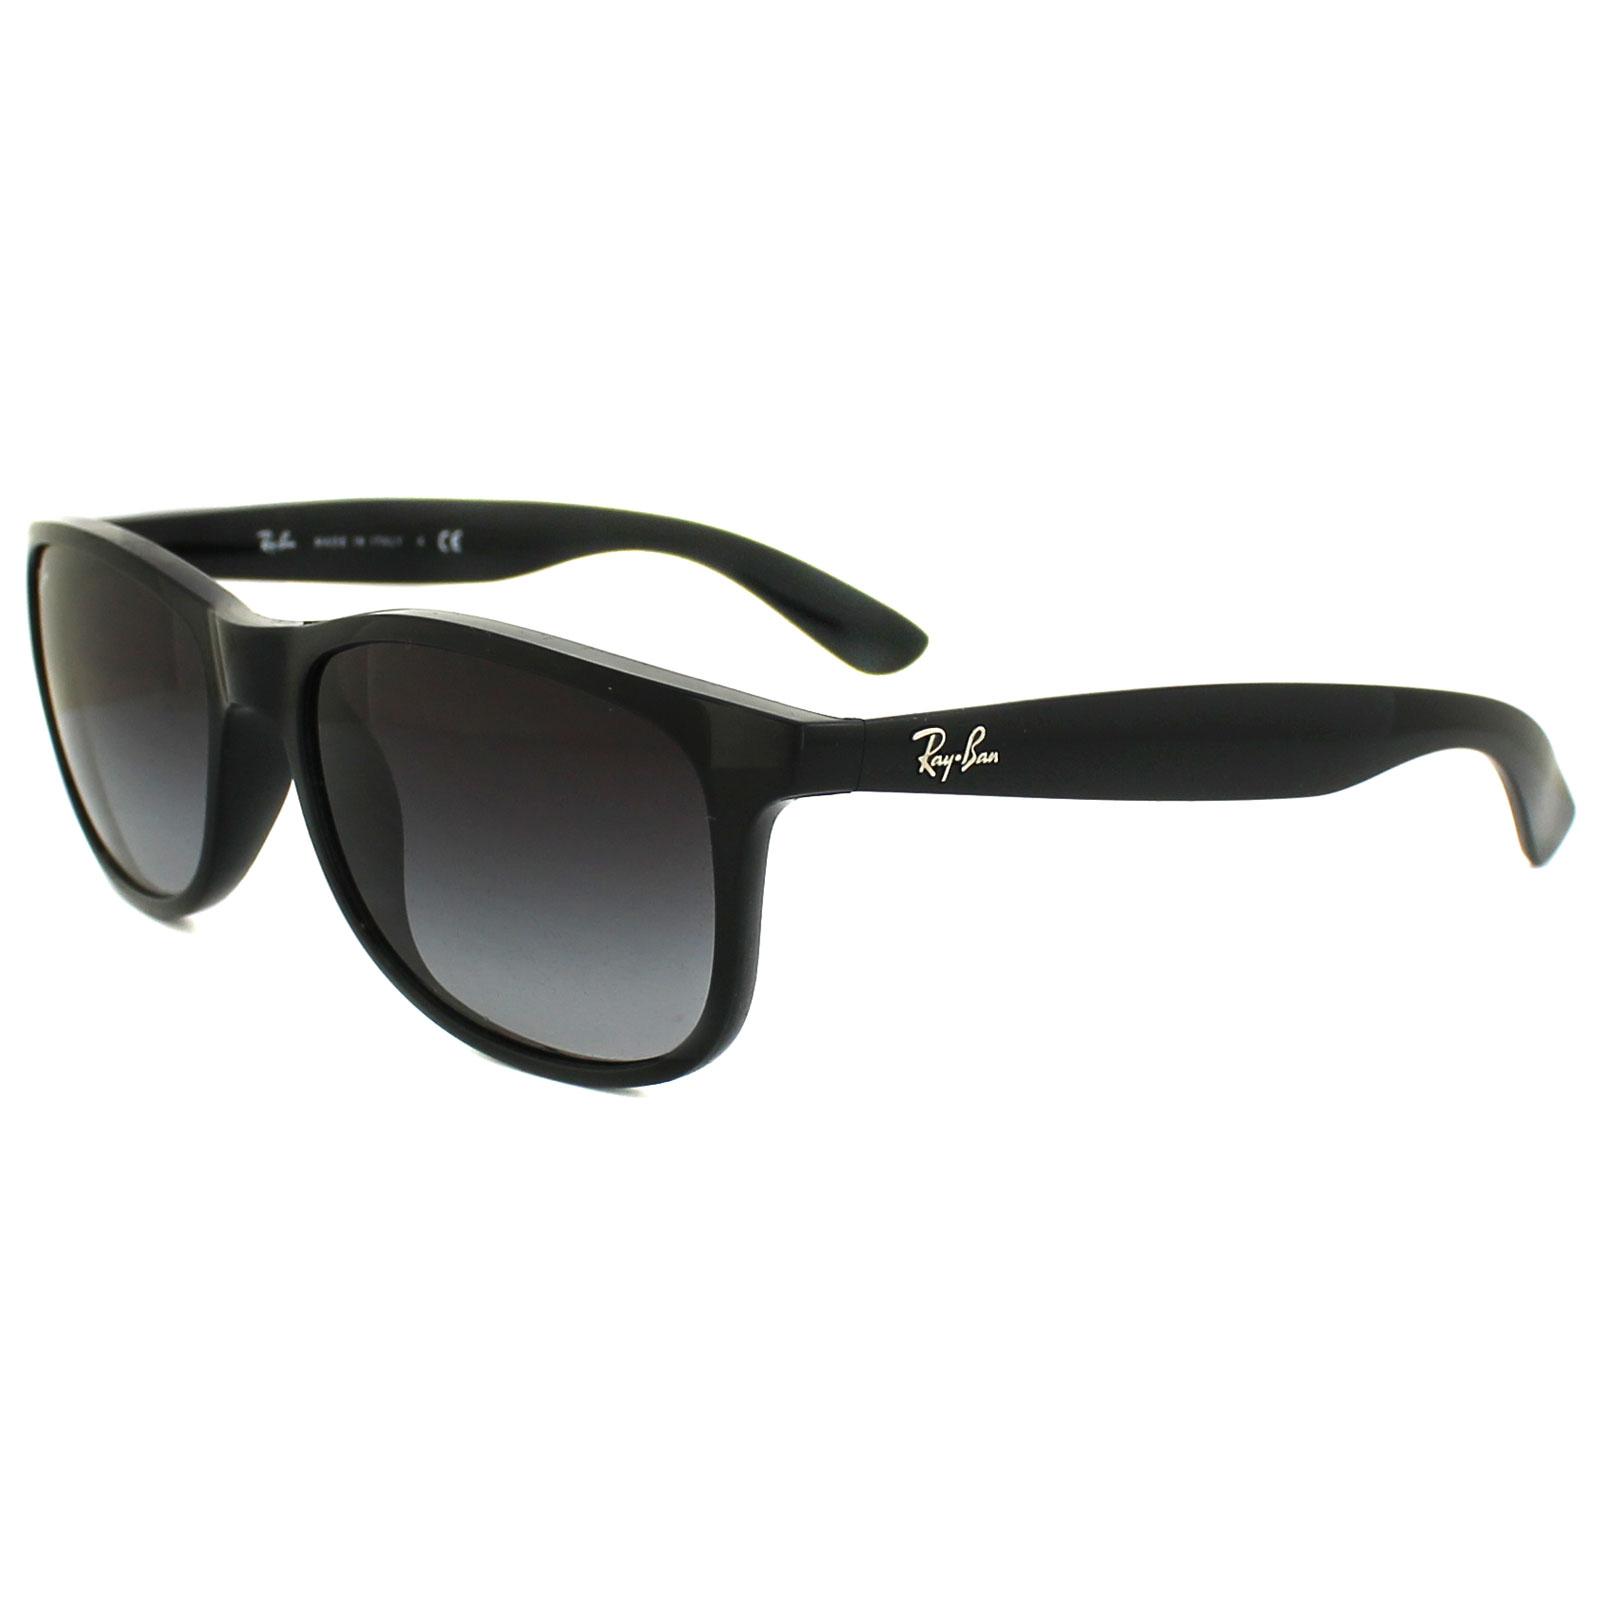 black trixes dp outdoors cute glasses com bag sunglasses style travel reading bmw amazon hard zipper sports case